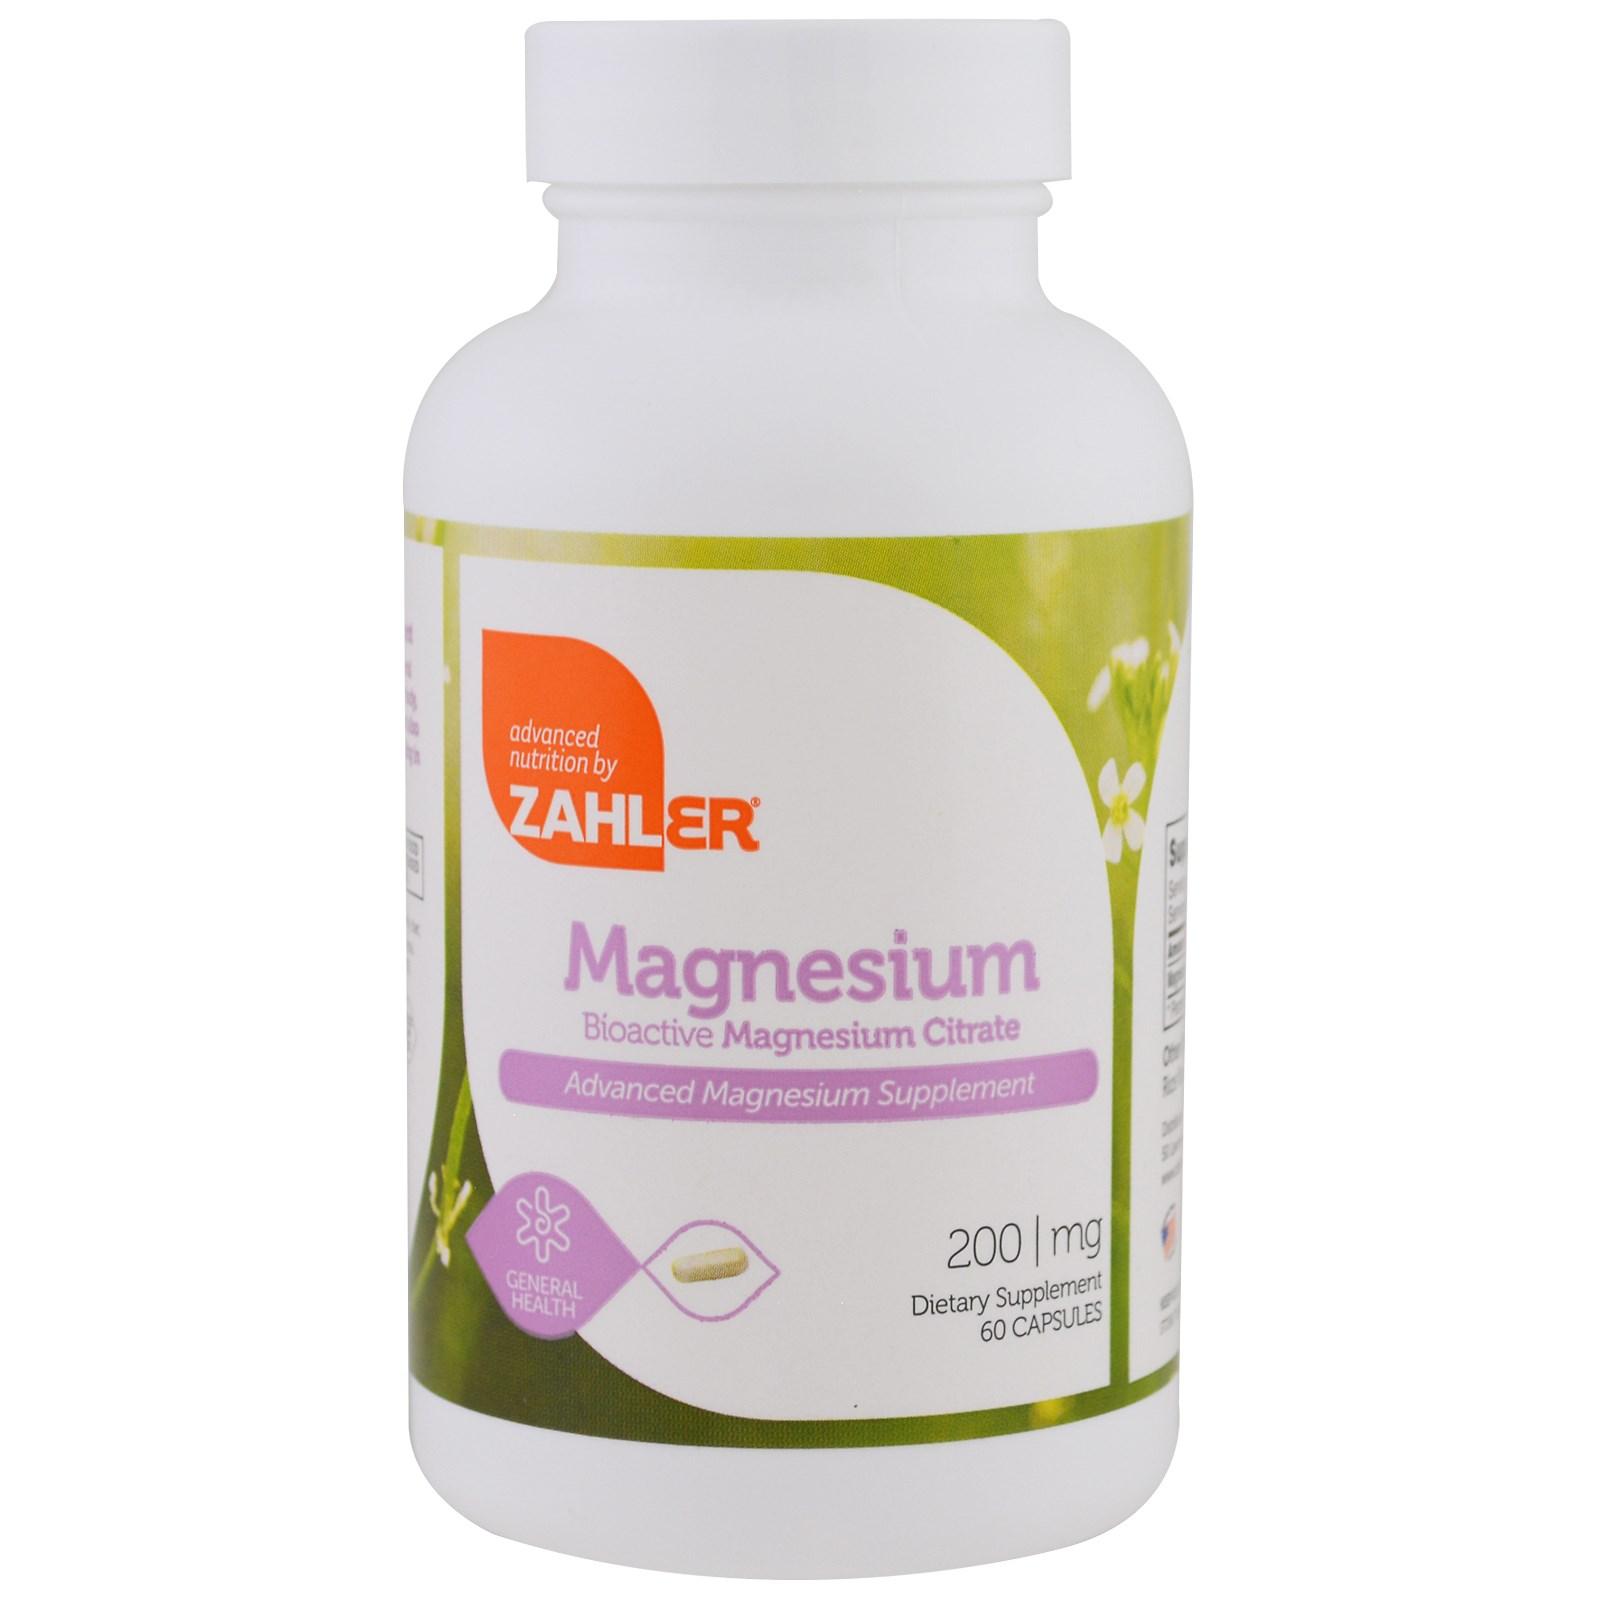 Zahler, Magnesium, 200 mg, 60 Capsules